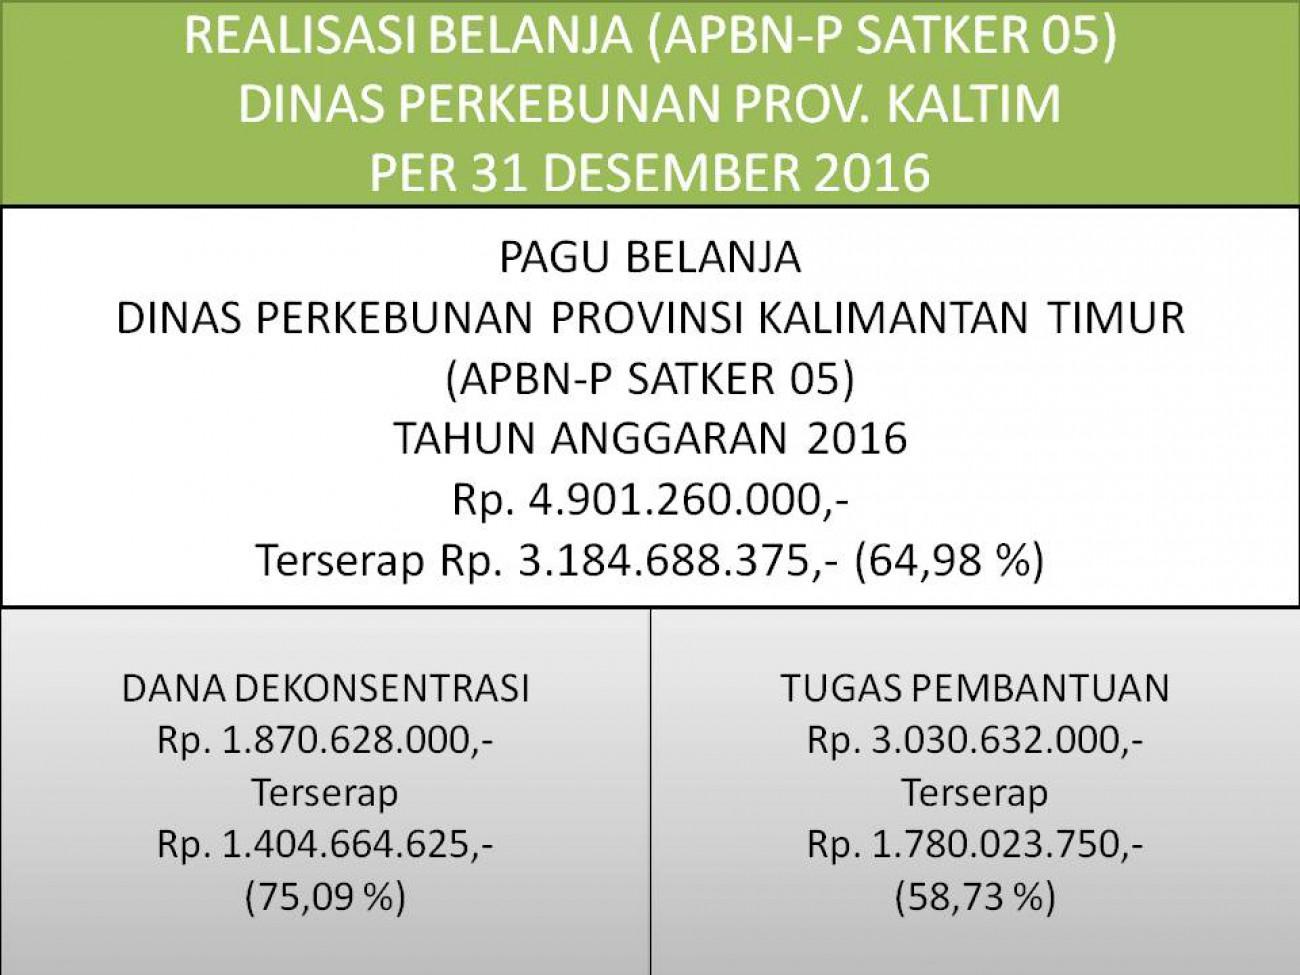 Laporan Realisasi APBN Satker 05 (Direktorat Jenderal Perkebunan) Dinas Perkebunan Prov. Kaltim Per 31 Desember 2016